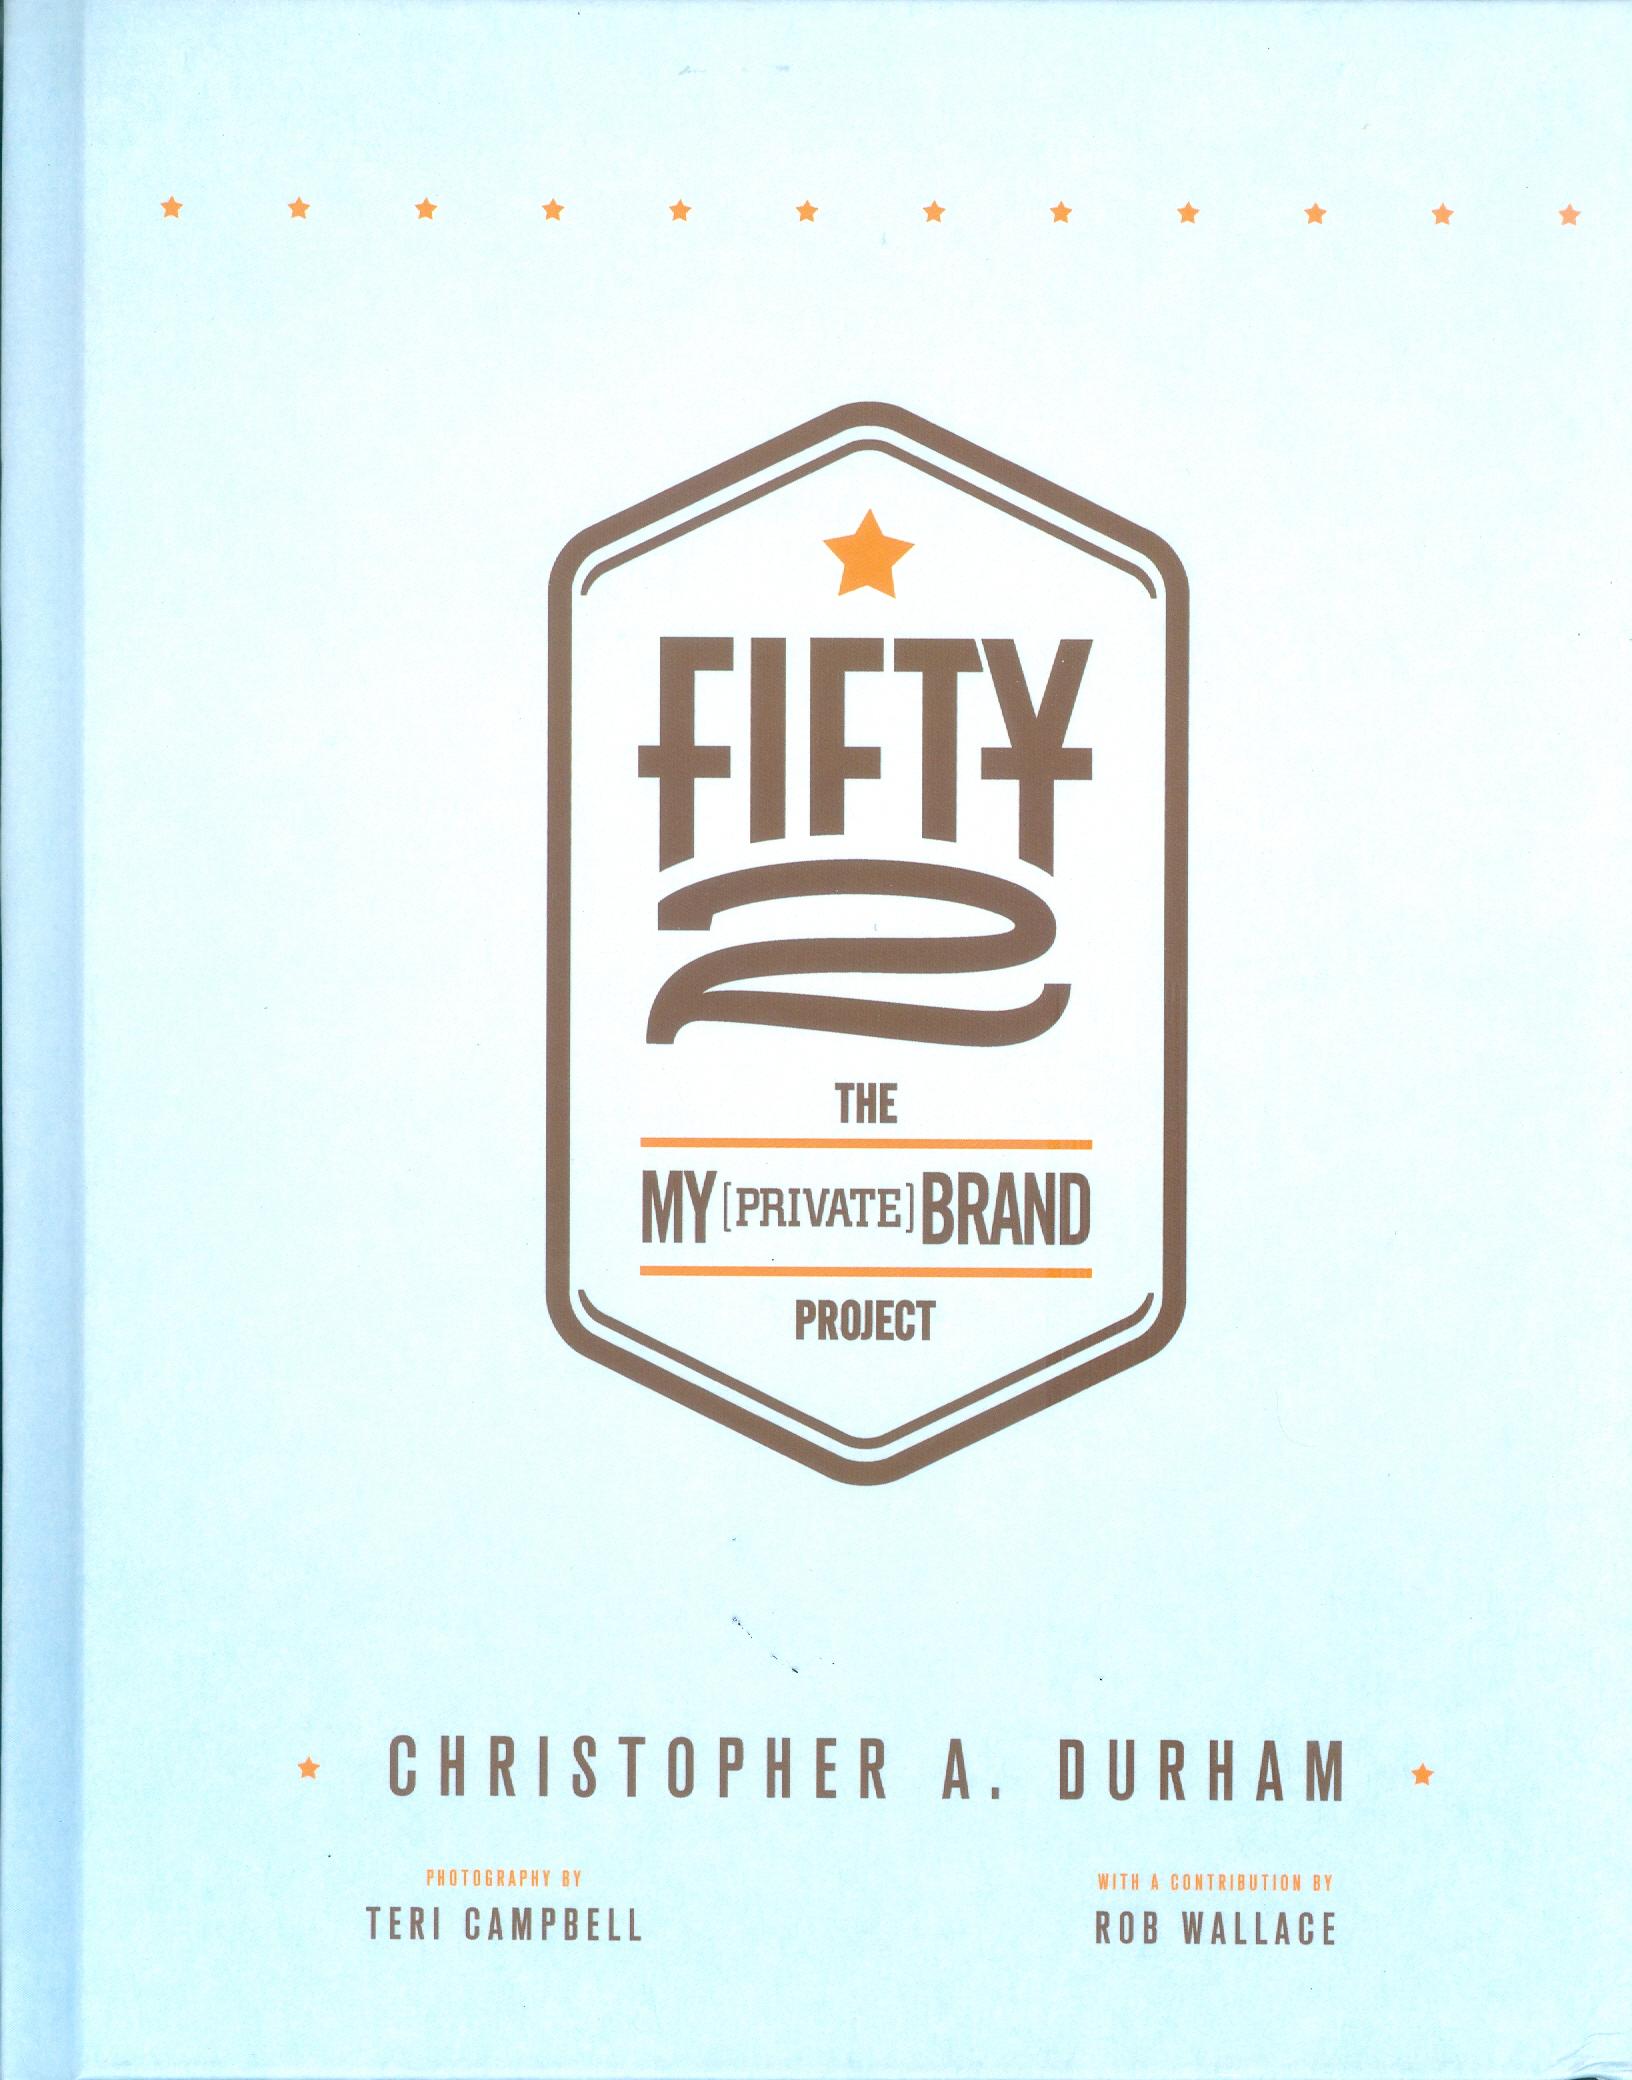 designing brand identity 5th edition pdf